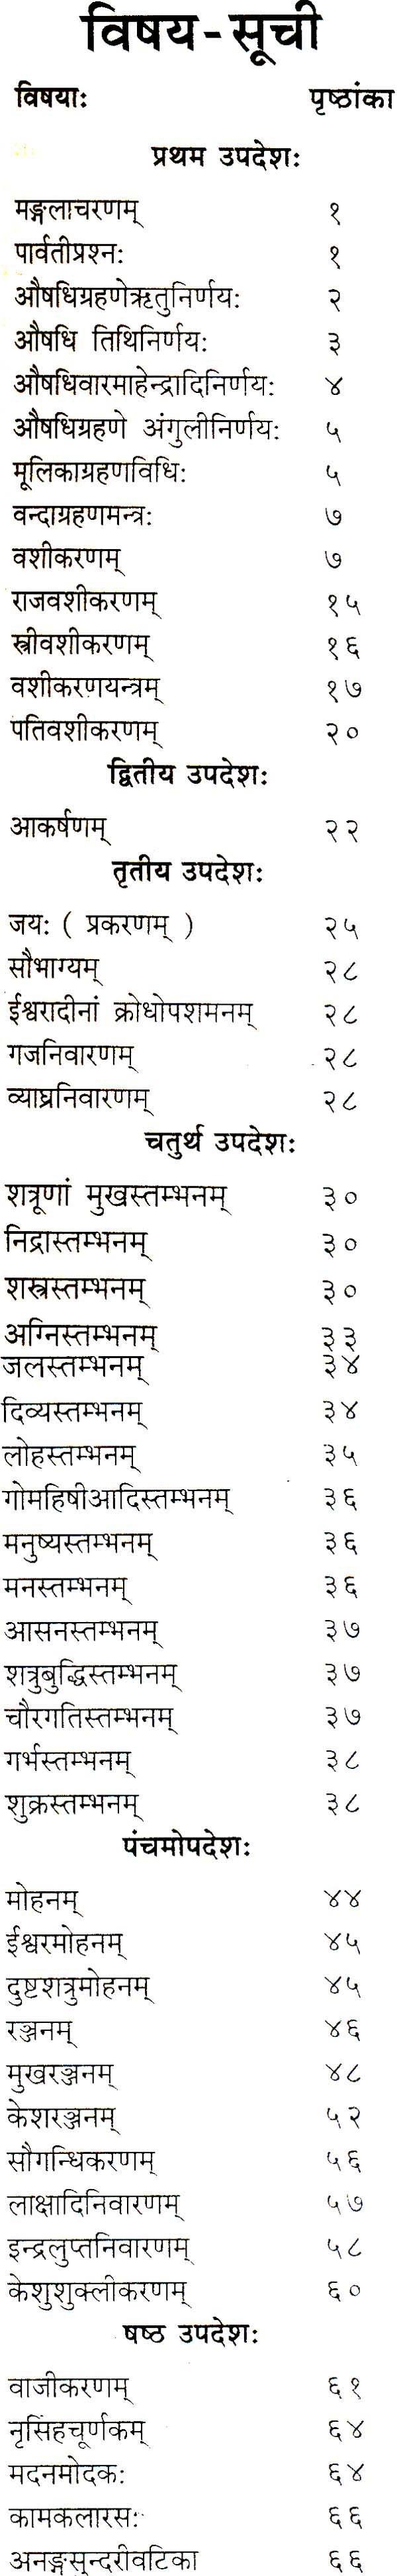 कामरत्न तंत्रम Kamaratna Tantram (Sanskrit Text